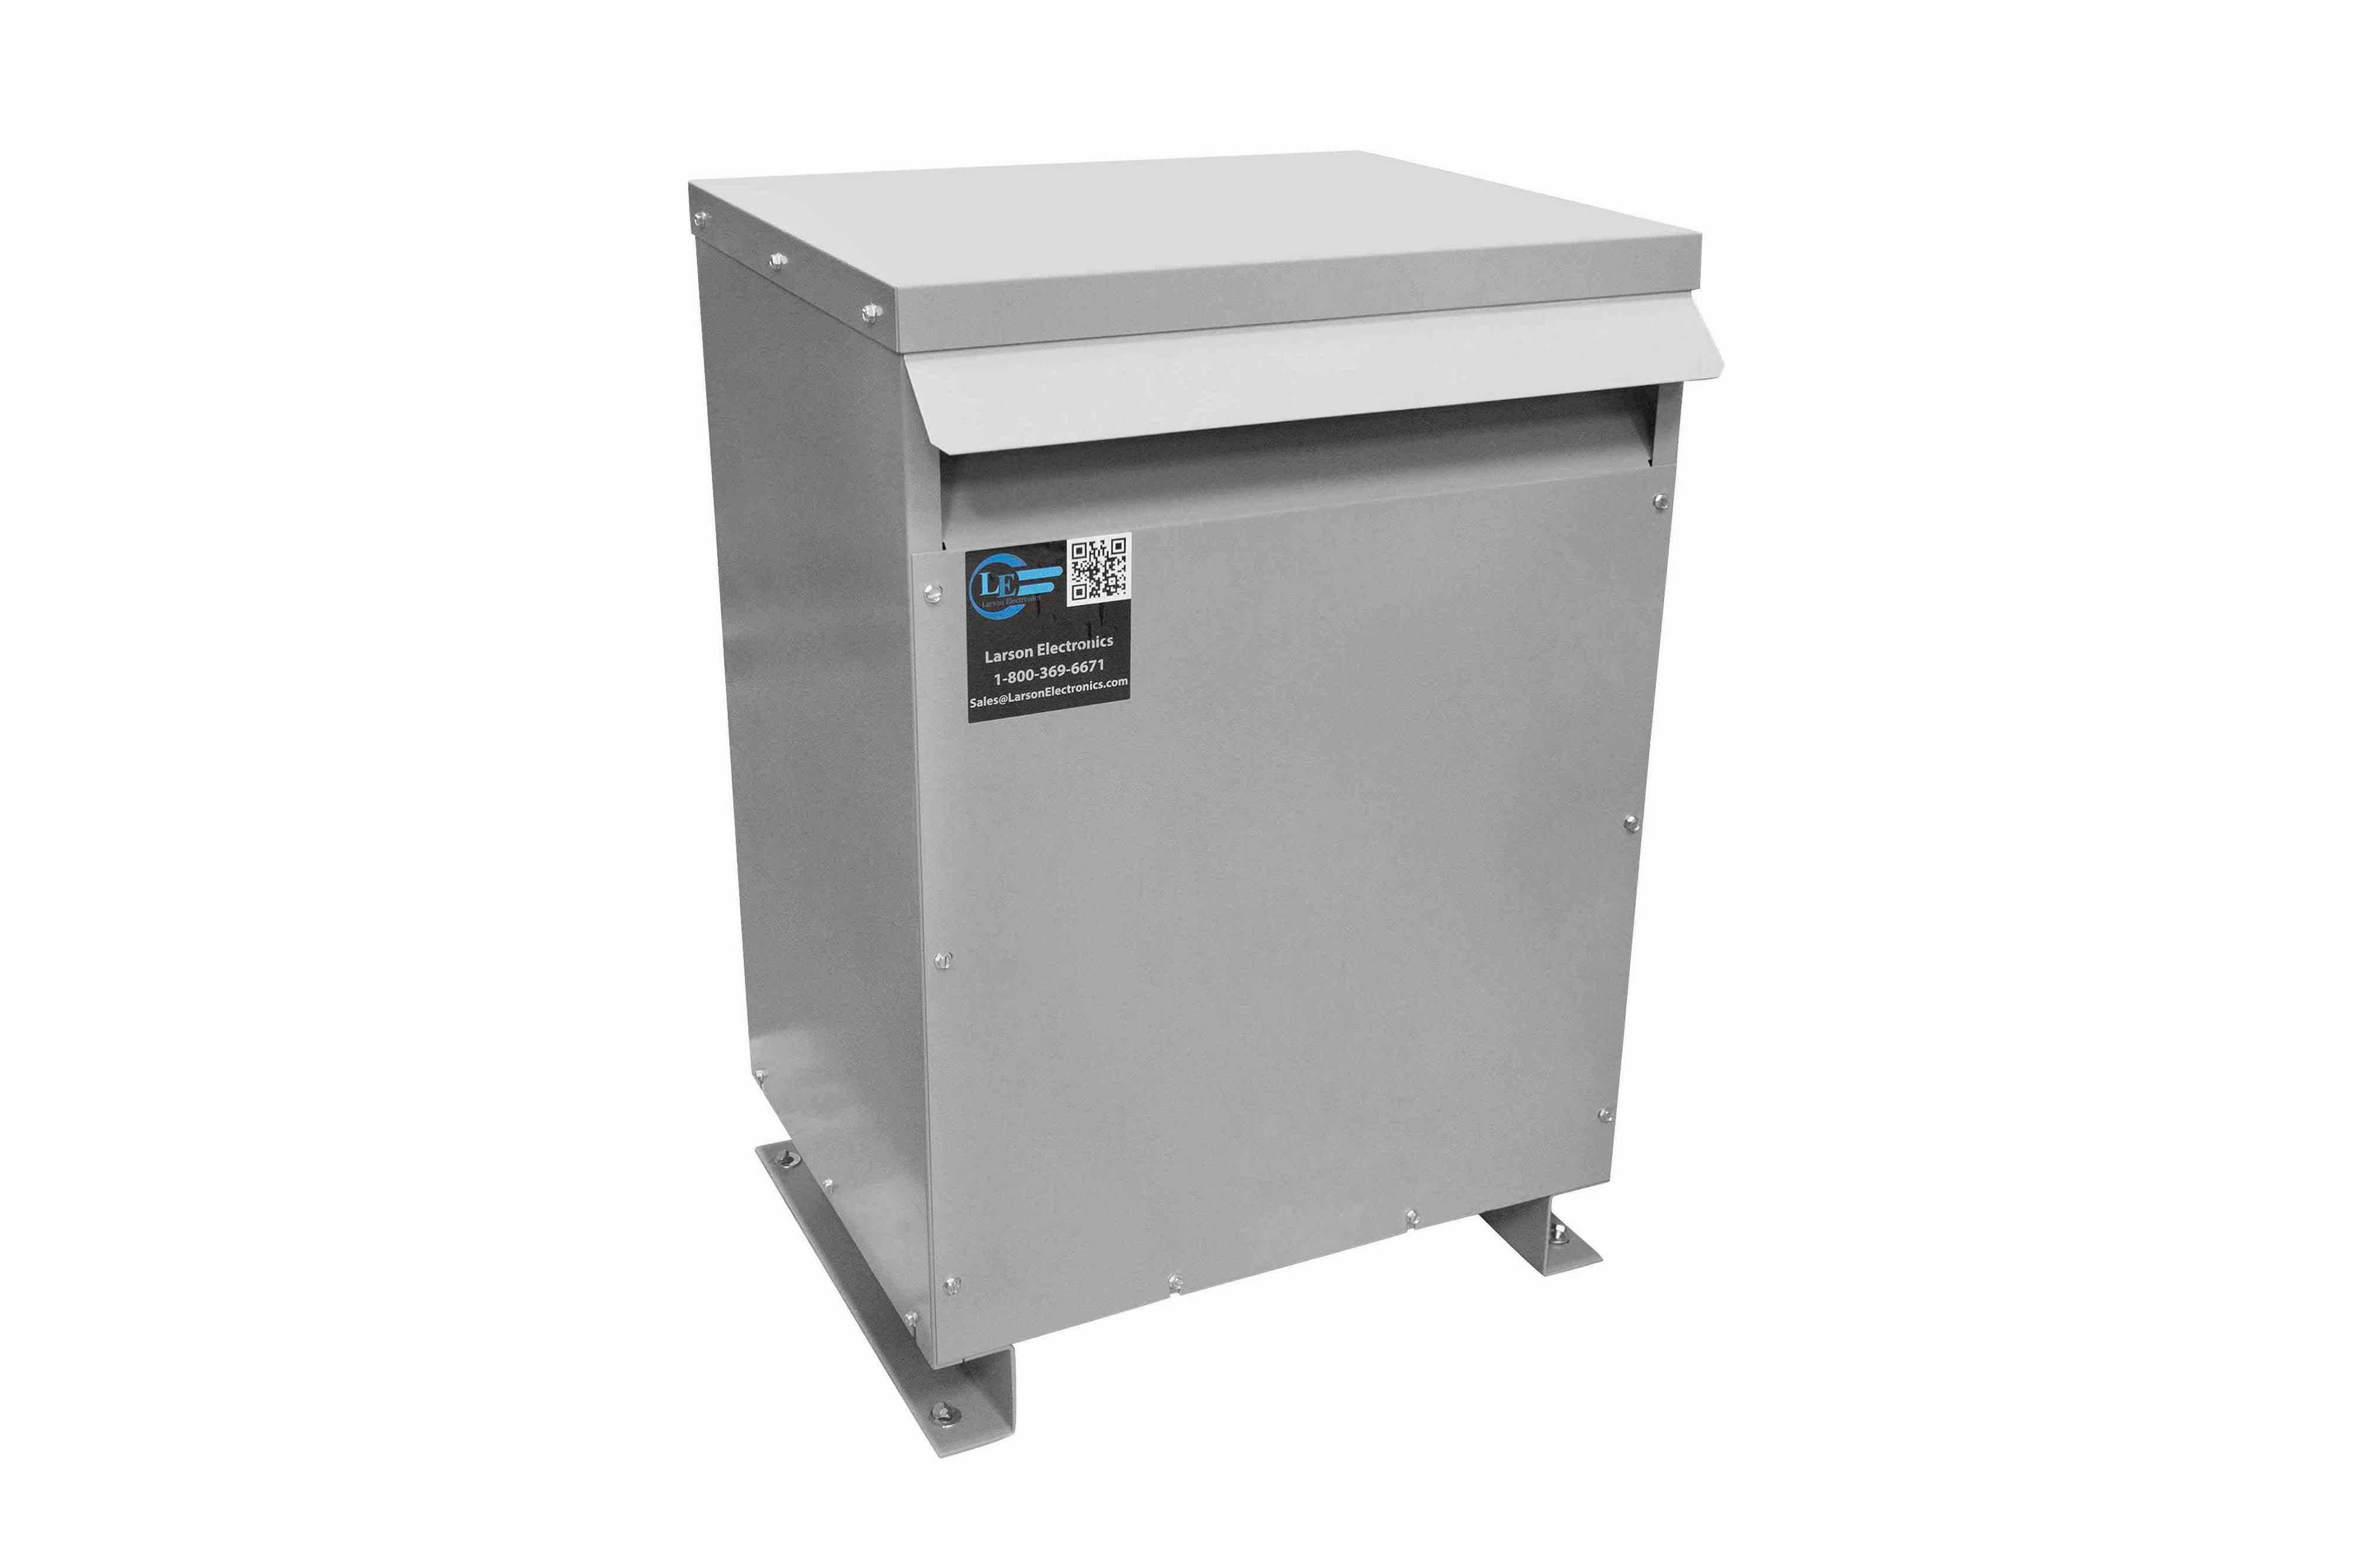 25 kVA 3PH Isolation Transformer, 208V Wye Primary, 480Y/277 Wye-N Secondary, N3R, Ventilated, 60 Hz